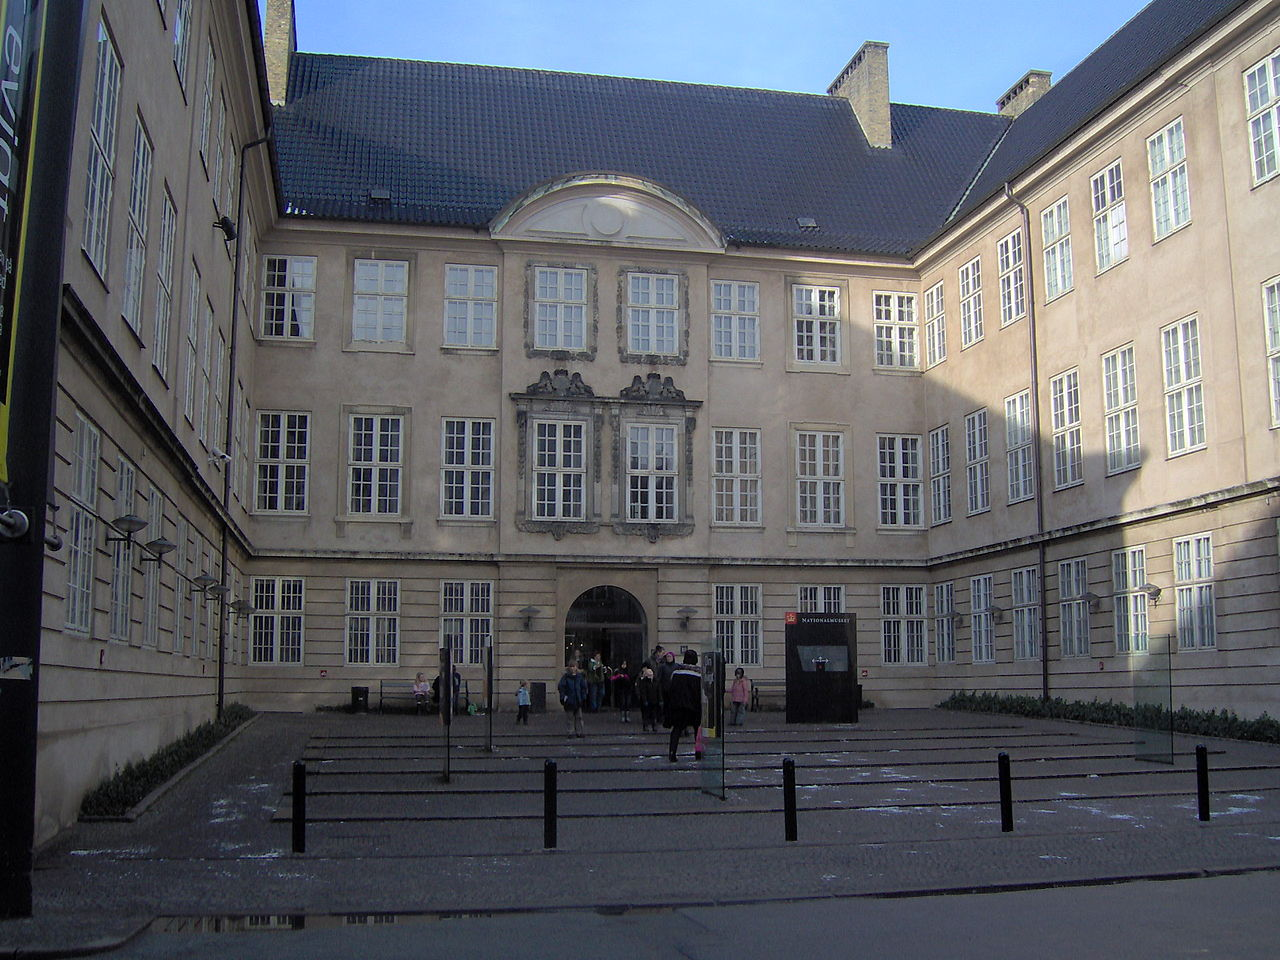 Muzeul National din Copenhaga1